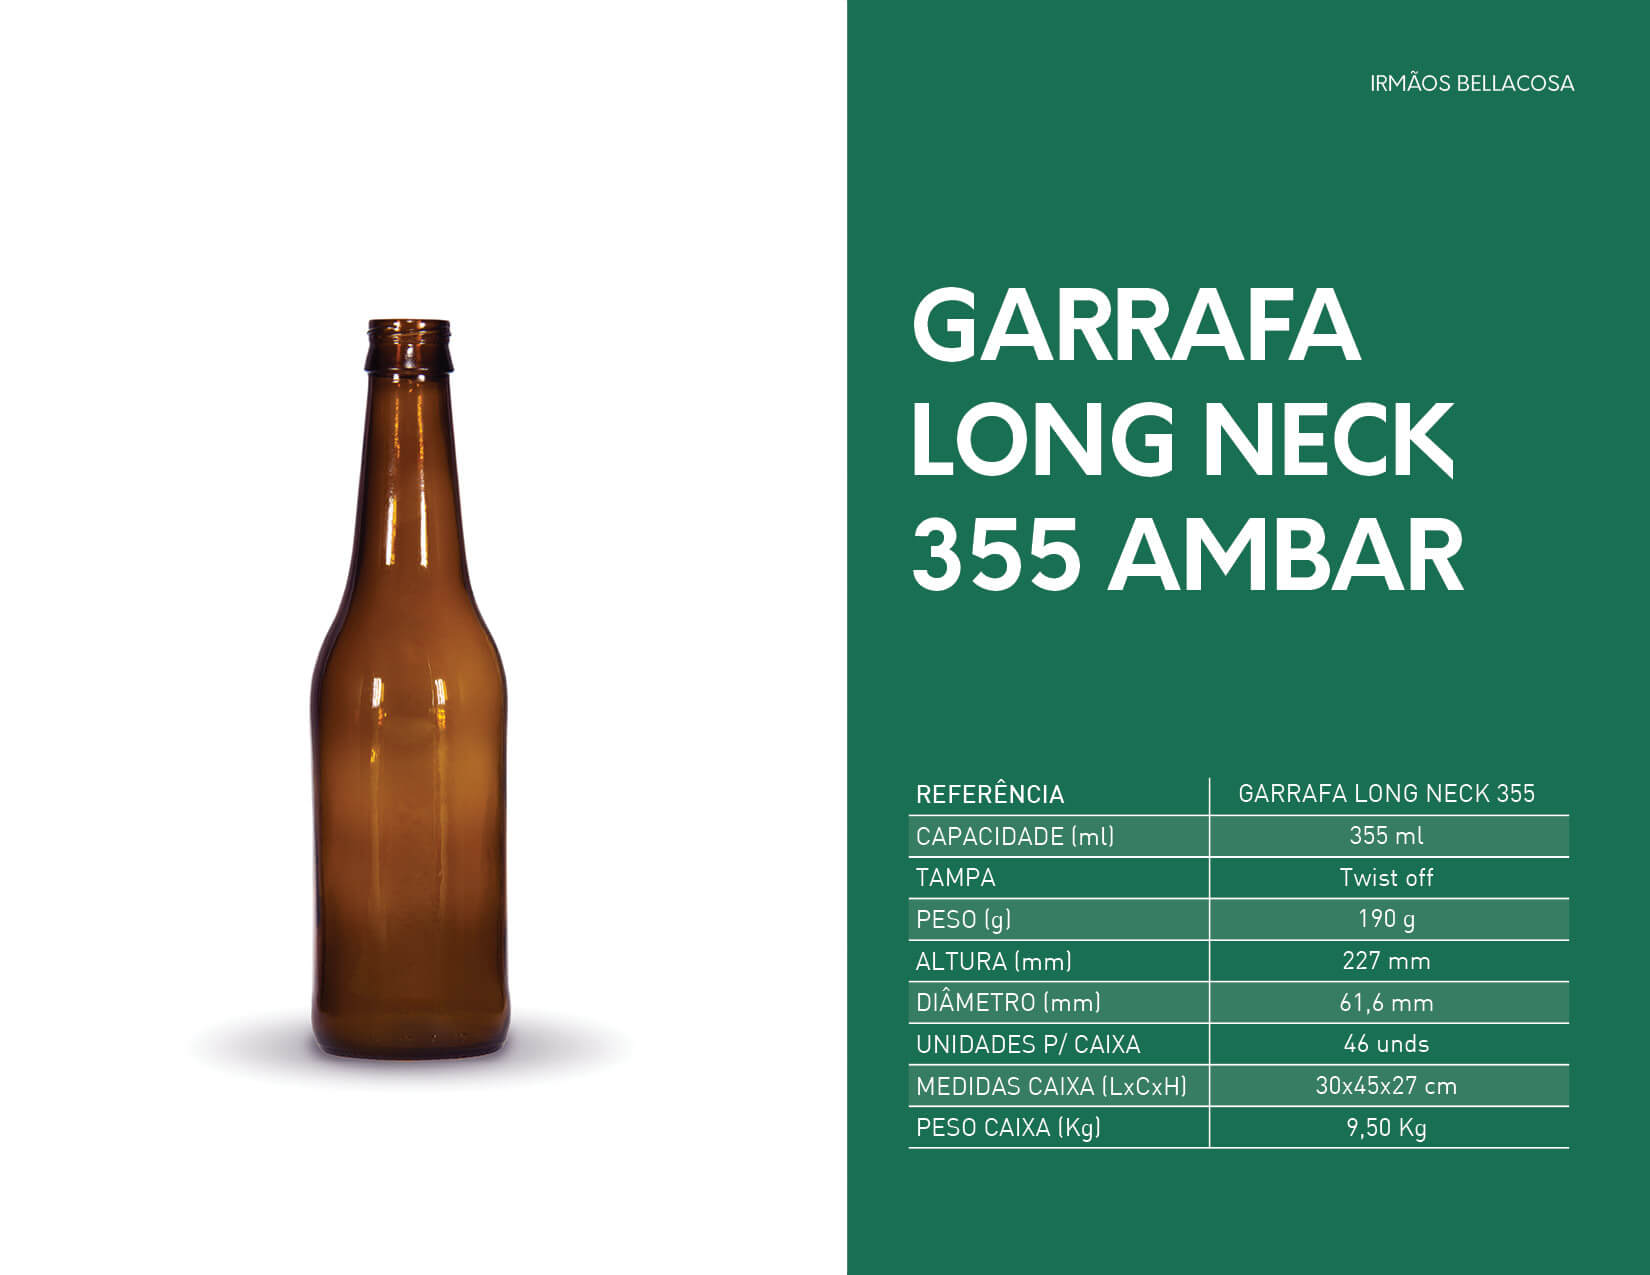 053-Garrafa-Cerveja-Long-Neck-Ambar-355-irmaos-bellacosa-embalagens-de-vidro